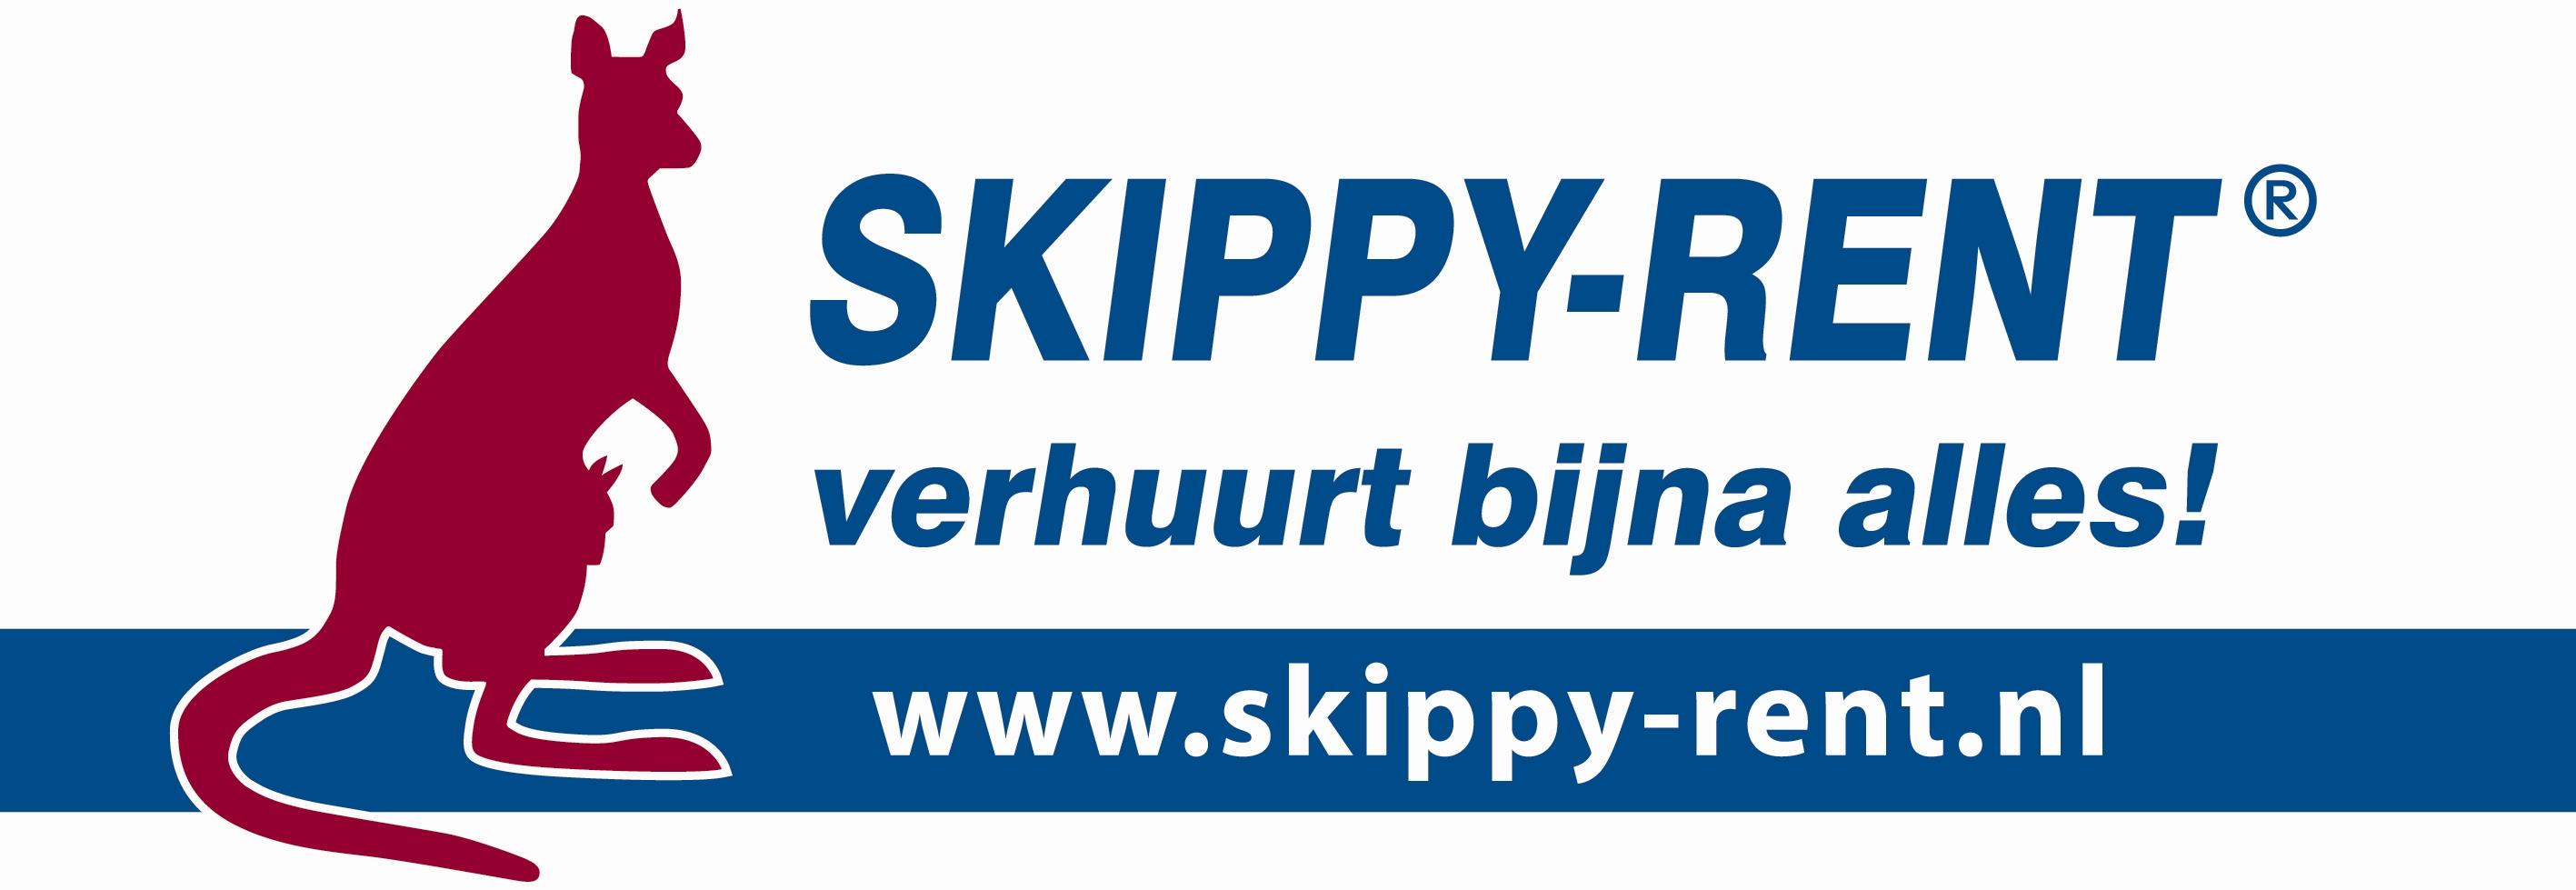 LOGO origineel skippy-rent